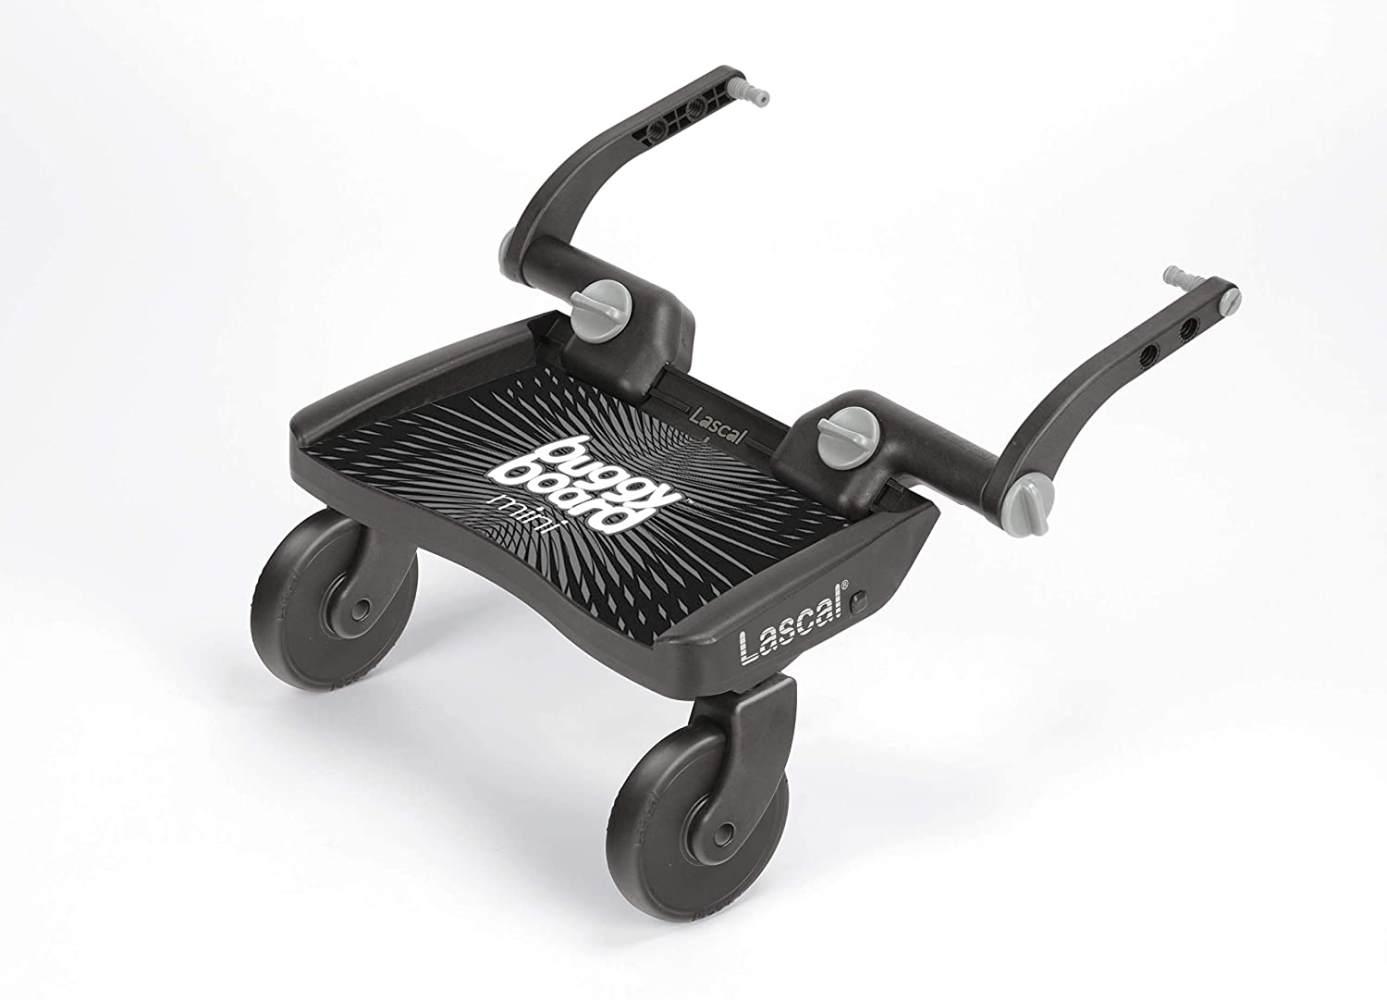 Lascal 'Mini' Buggyboard Mini Schwarz, universell einsetzbar Bild 1